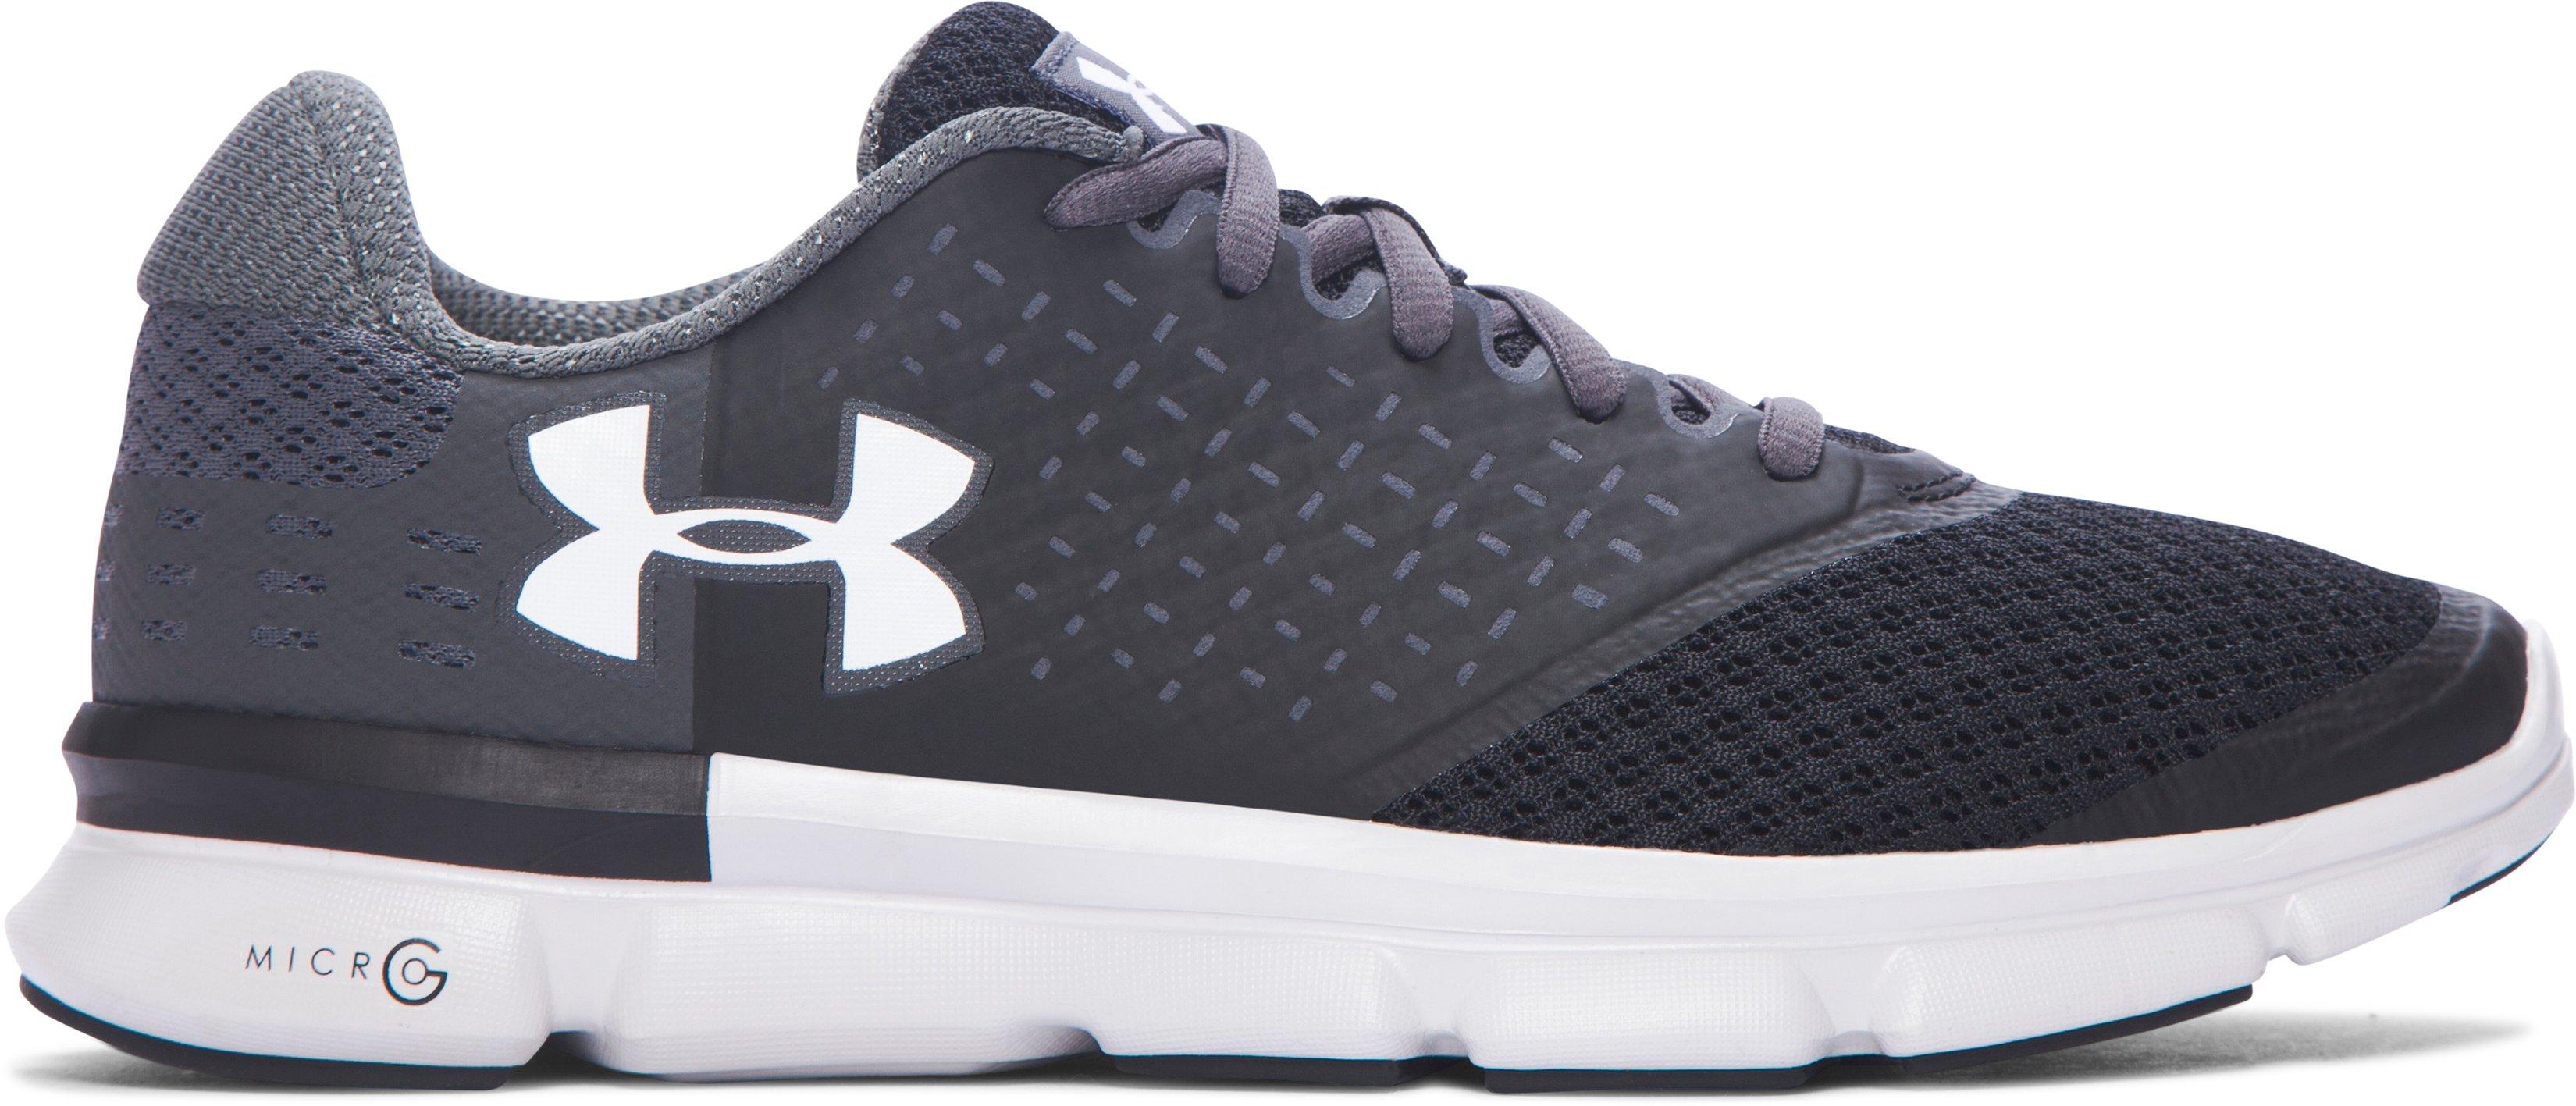 Zapatillas de Running UA Speed Swift 2 para Mujer, 360 degree view